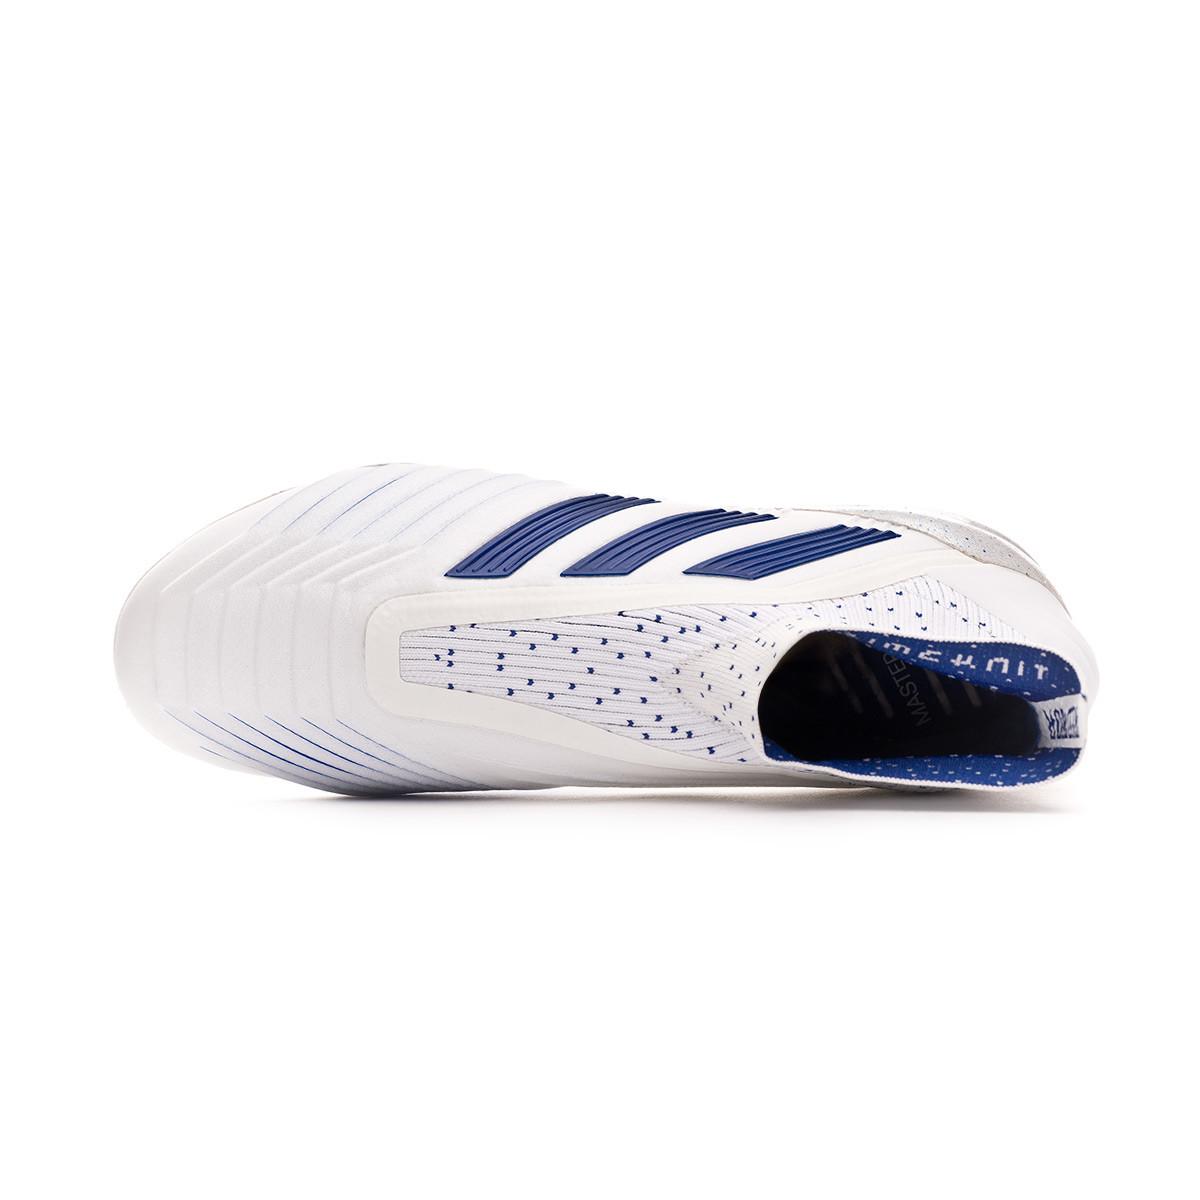 Chaussure de foot adidas Predator 19+ SG White Bold blue